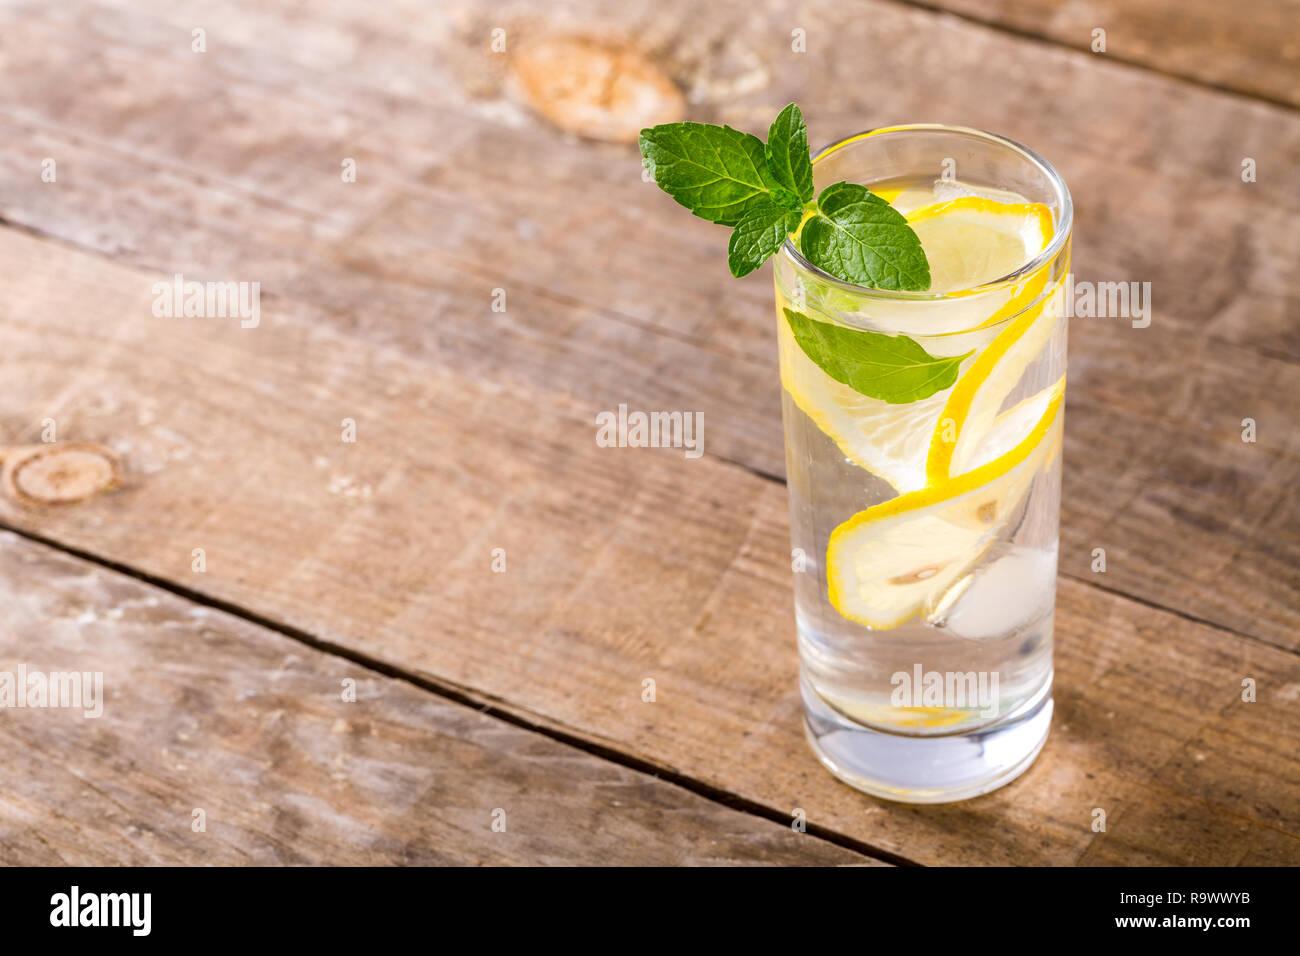 Closeup of fresh water with lemon, mint. Stock Photo